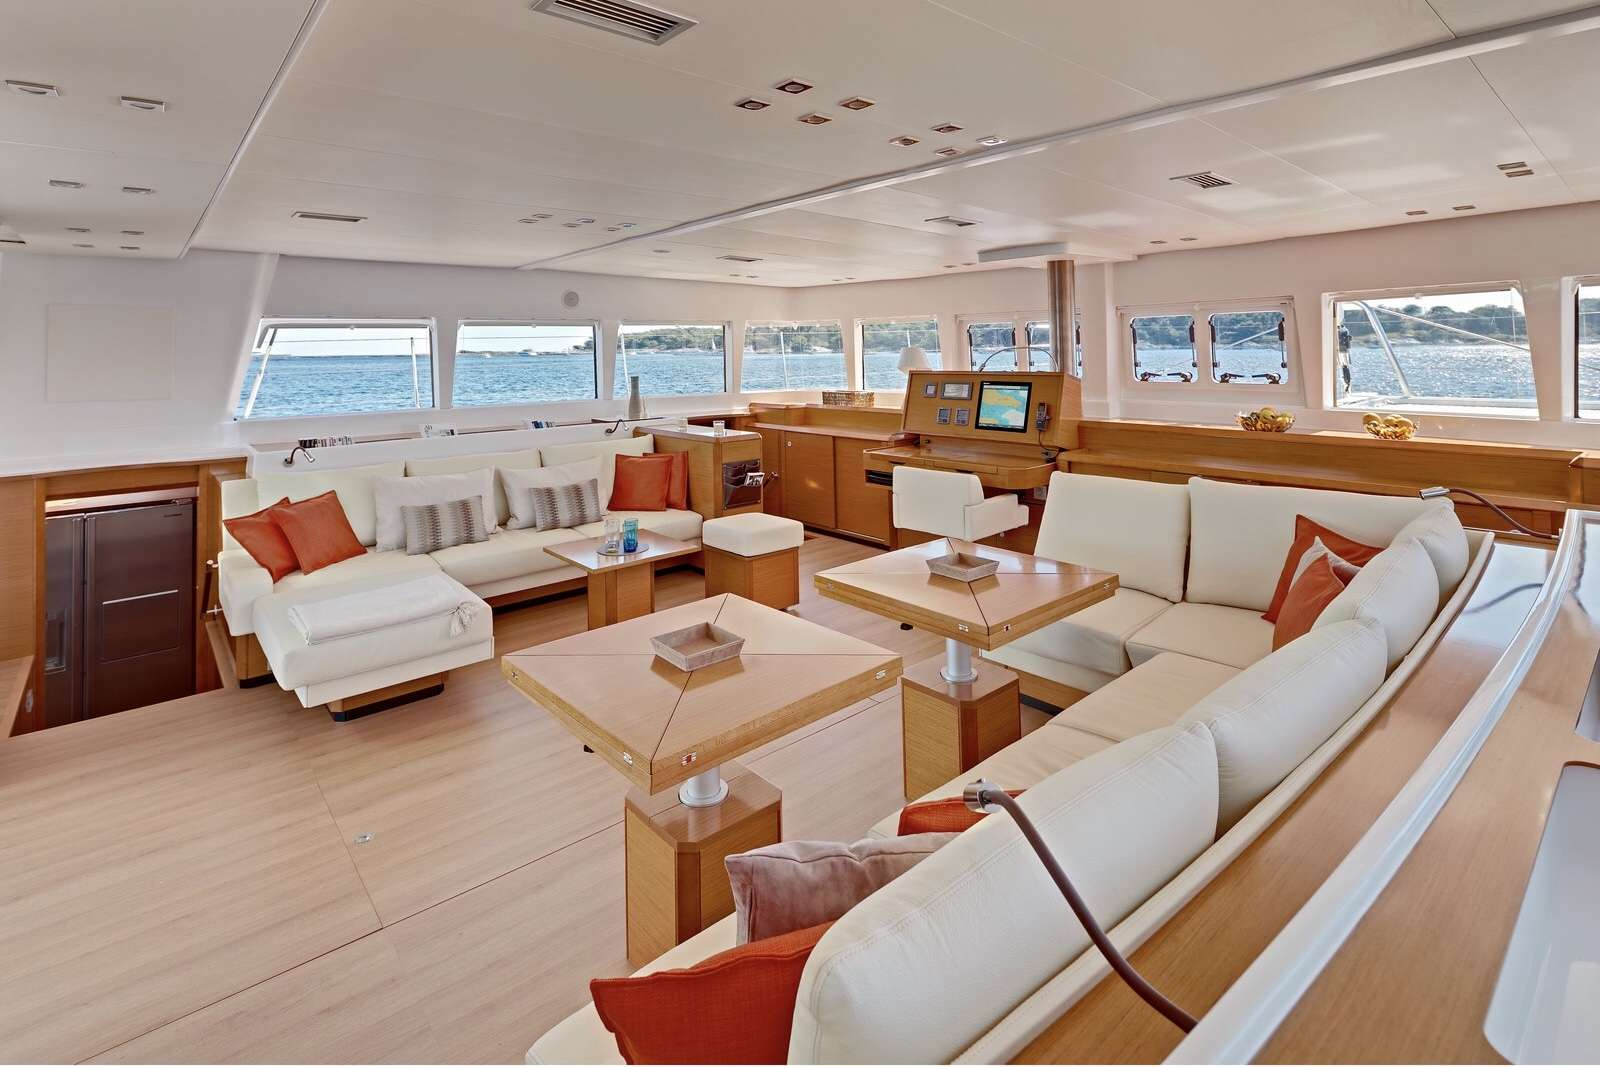 Cat Yacht 'Cat', 8 PAX, 3 Crew, 62.00 Ft, 18.00 Meters, Built 2013, Lagoon, Refit Year